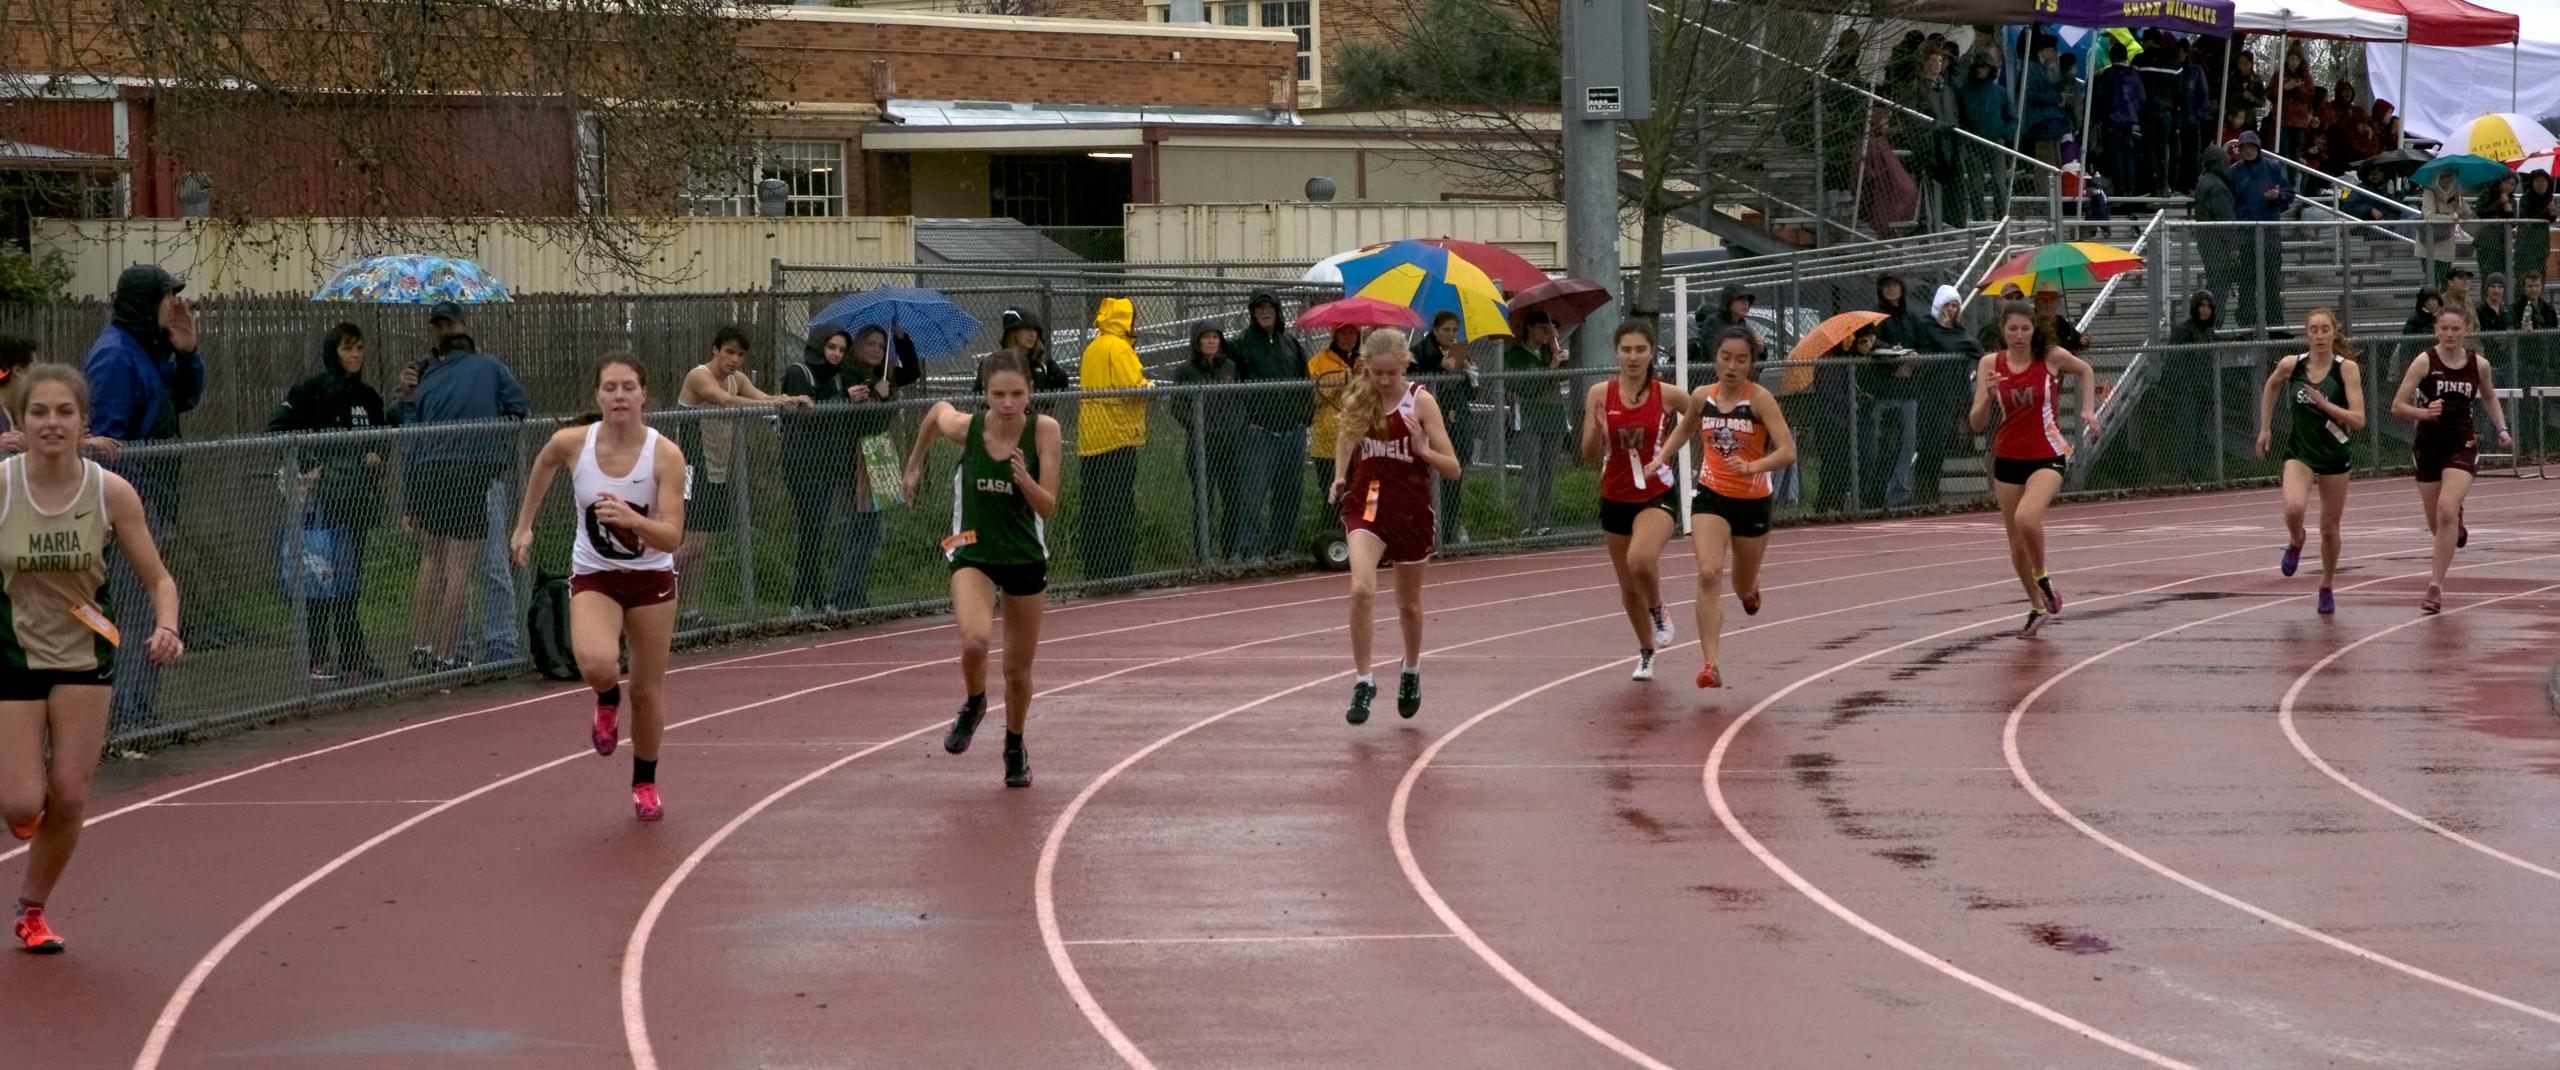 Start Final heat Varsity Girls 800m